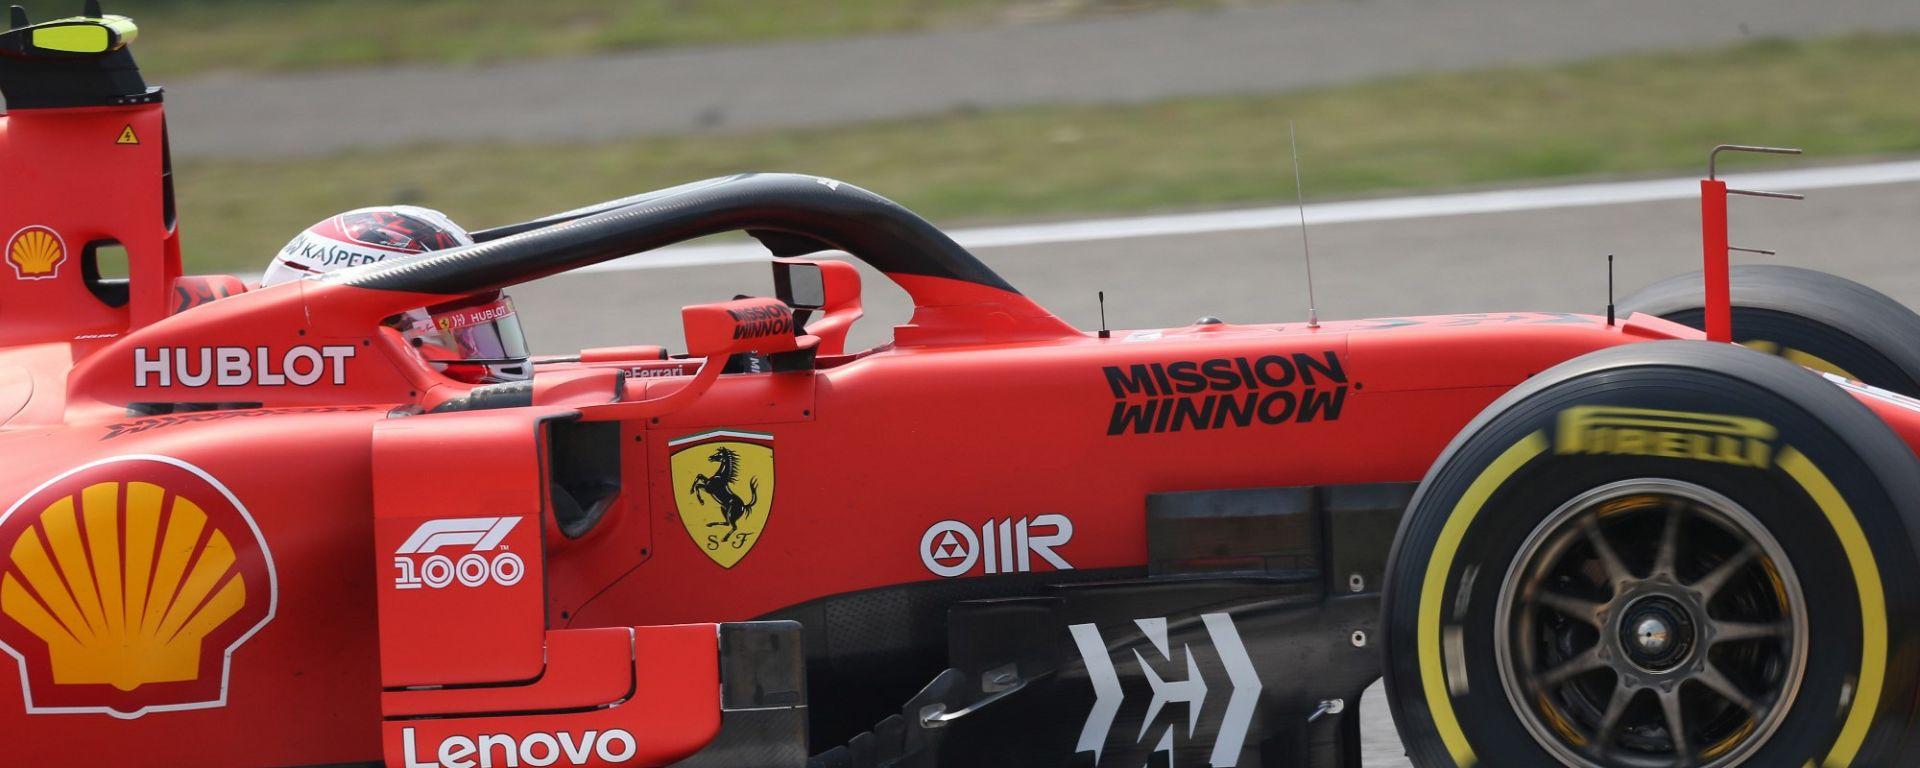 F1 GP Cina 2019, Ferrari: bene Vettel, Leclerc ancora problemi